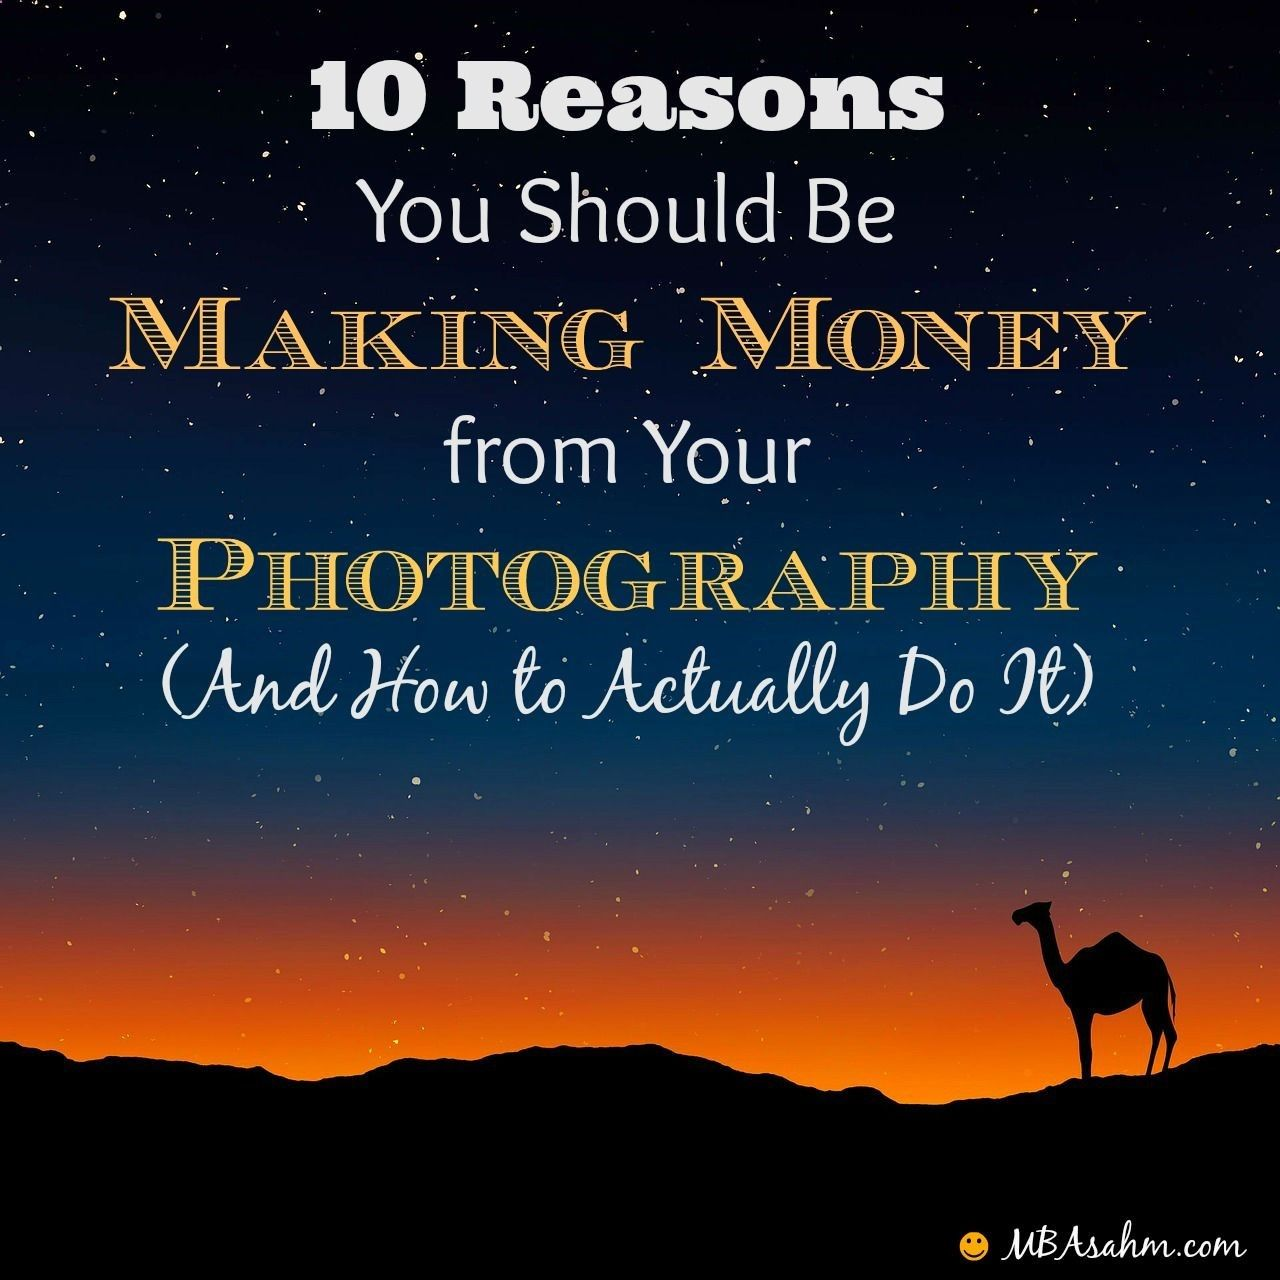 Free photo editing software downloads: digital